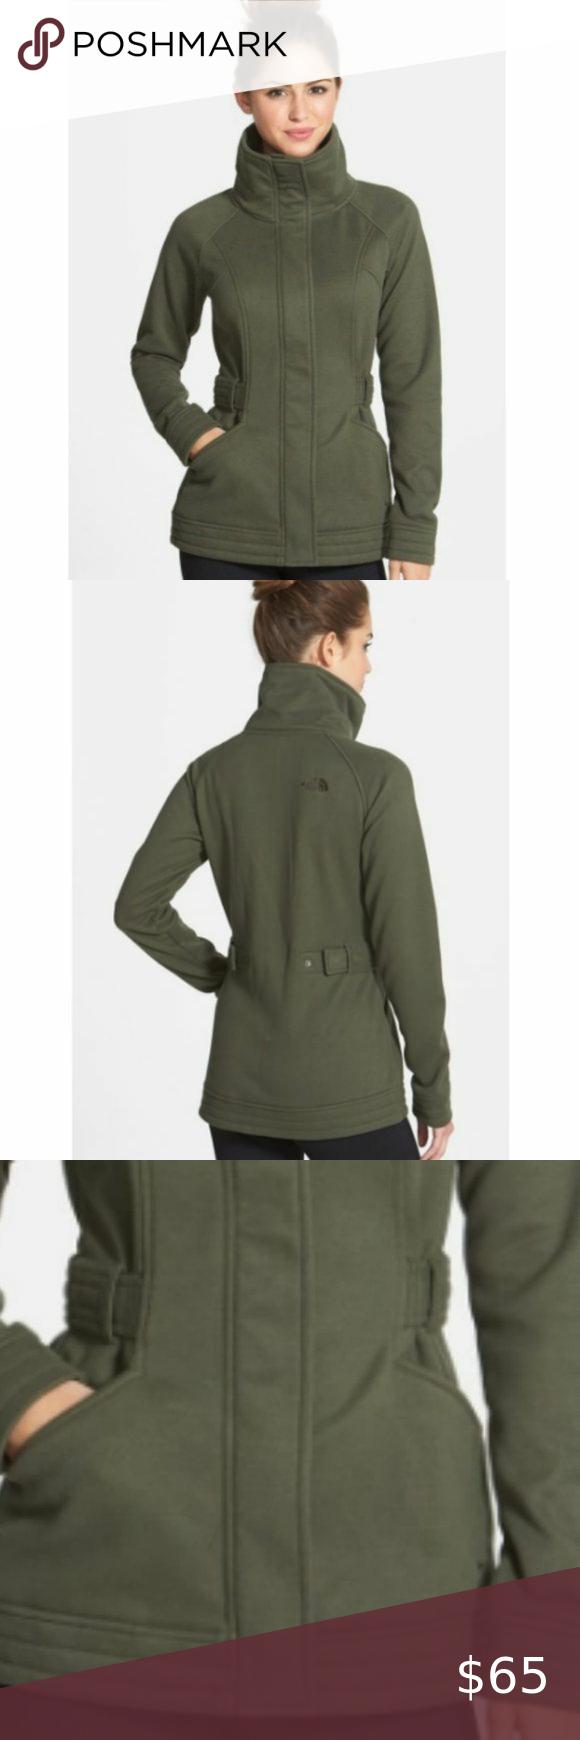 North Face Women S Olive Avery Fleece Jacket M North Face Women Fleece Jacket Jackets [ 1740 x 580 Pixel ]